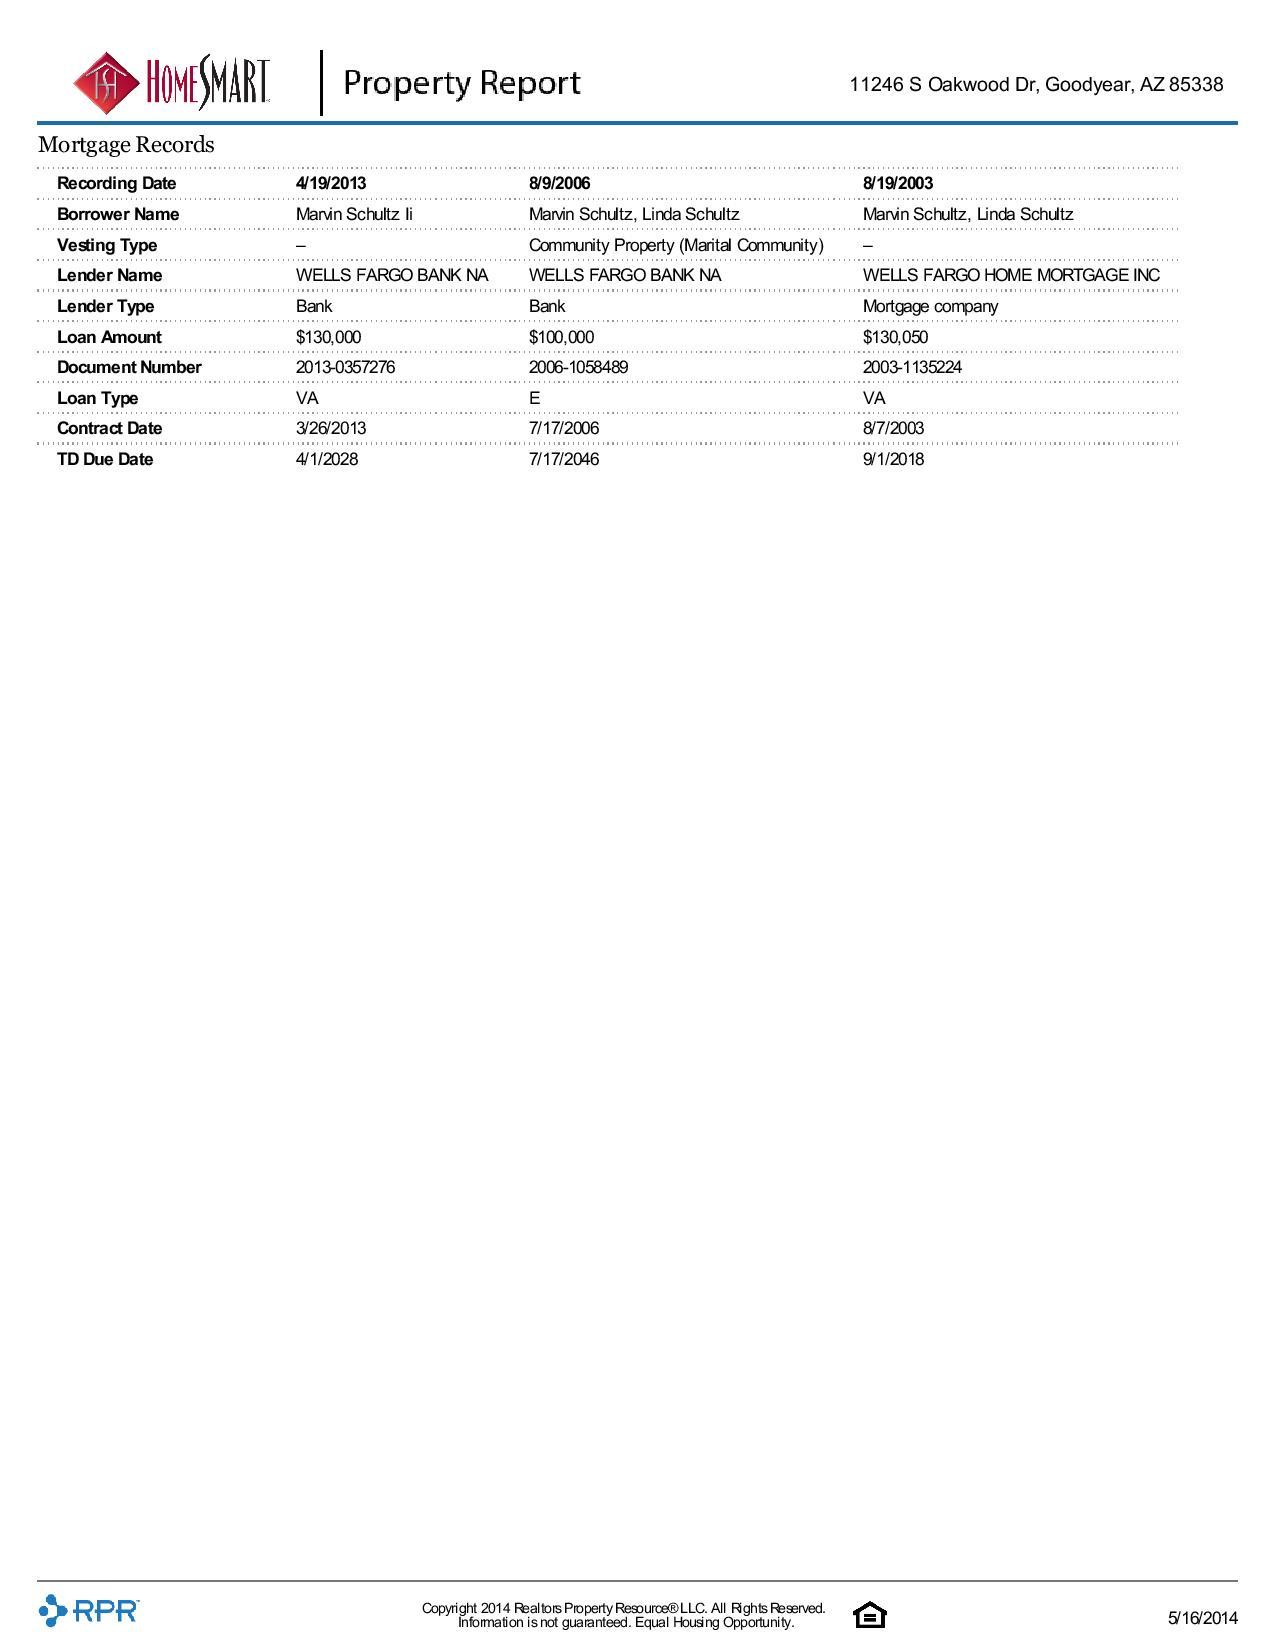 11246-S-Oakwood-Dr-Goodyear-AZ-85338-page-008